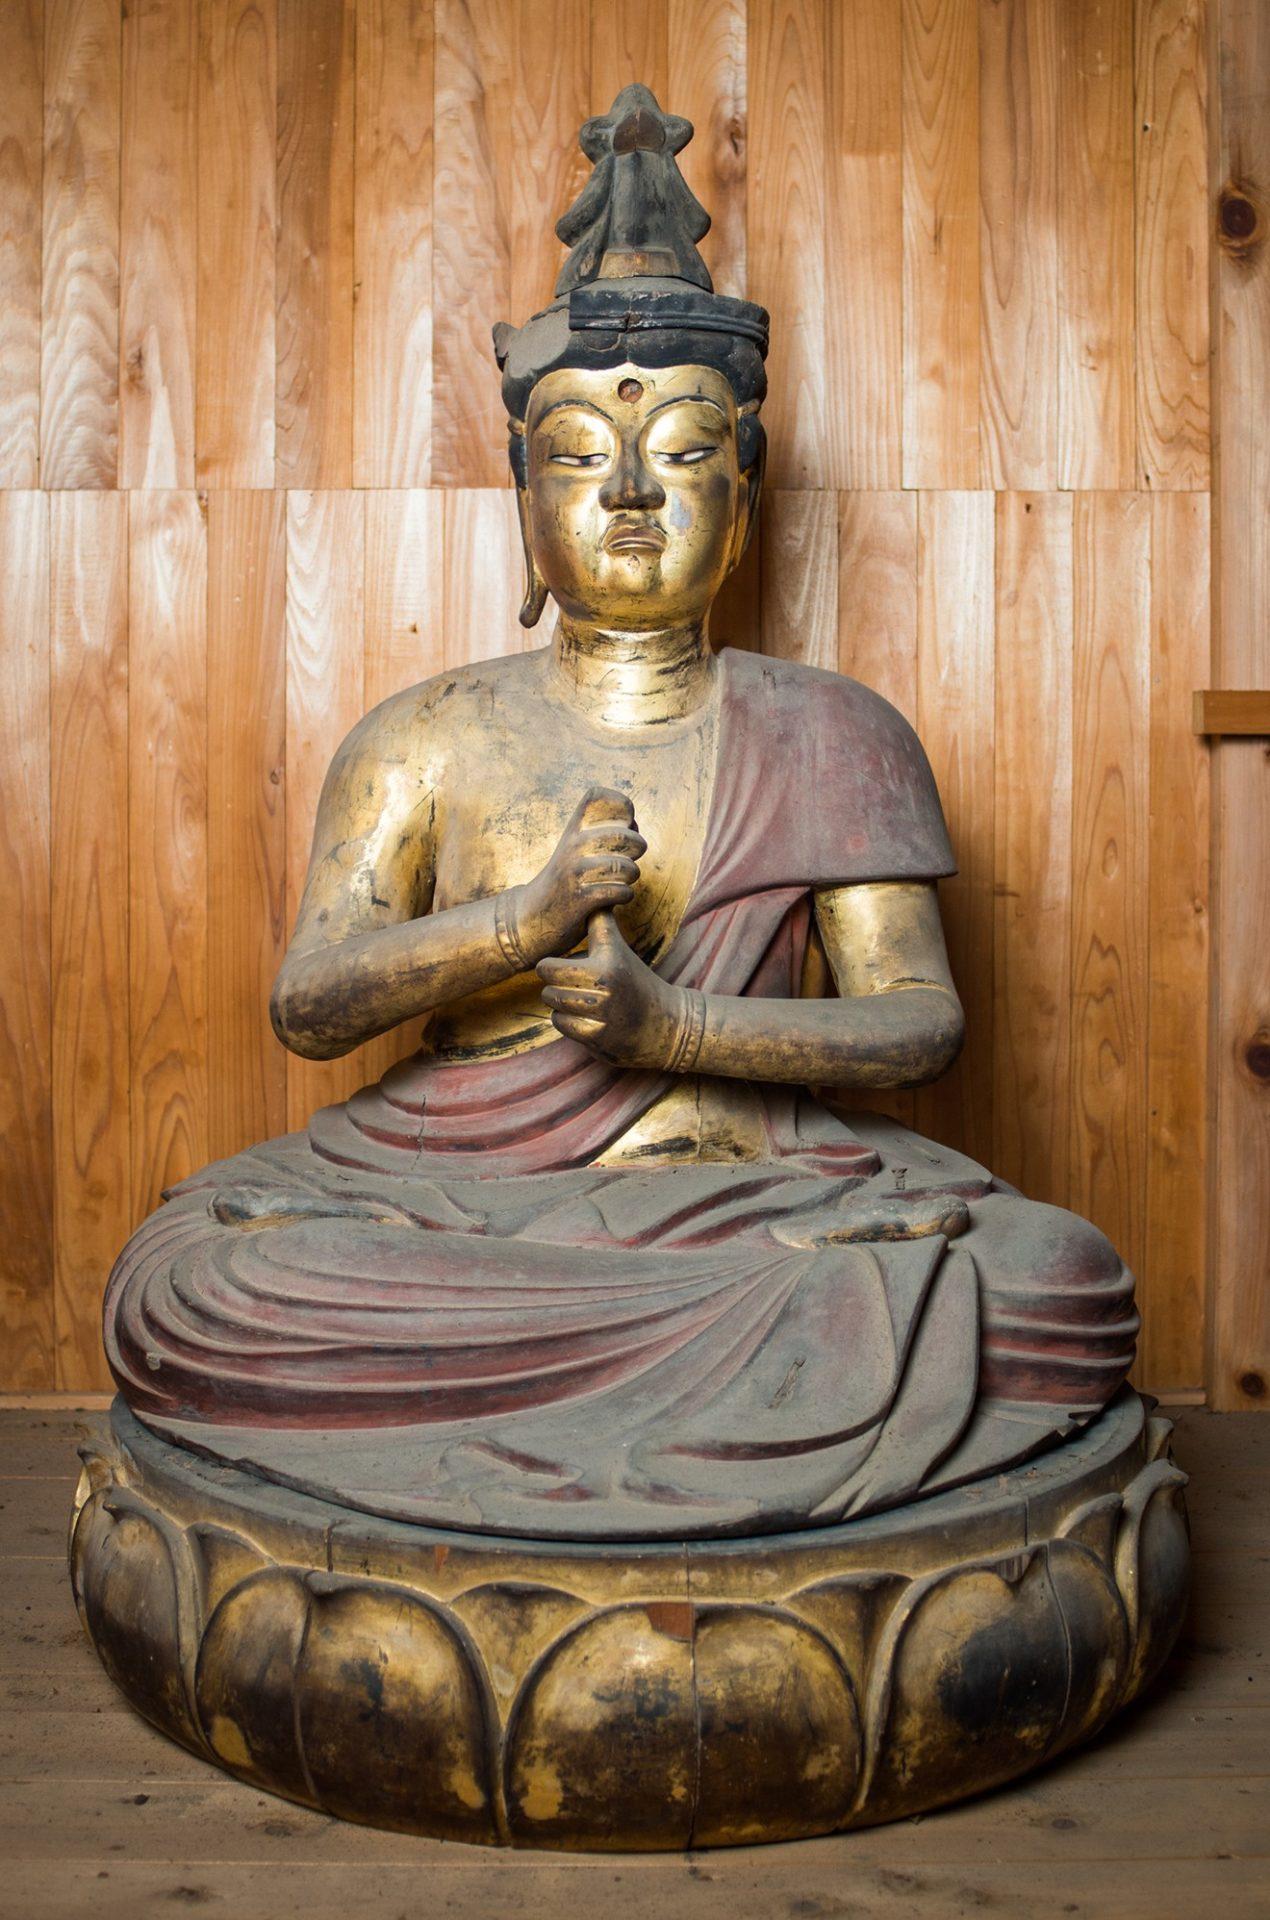 裾野光明寺の仏像